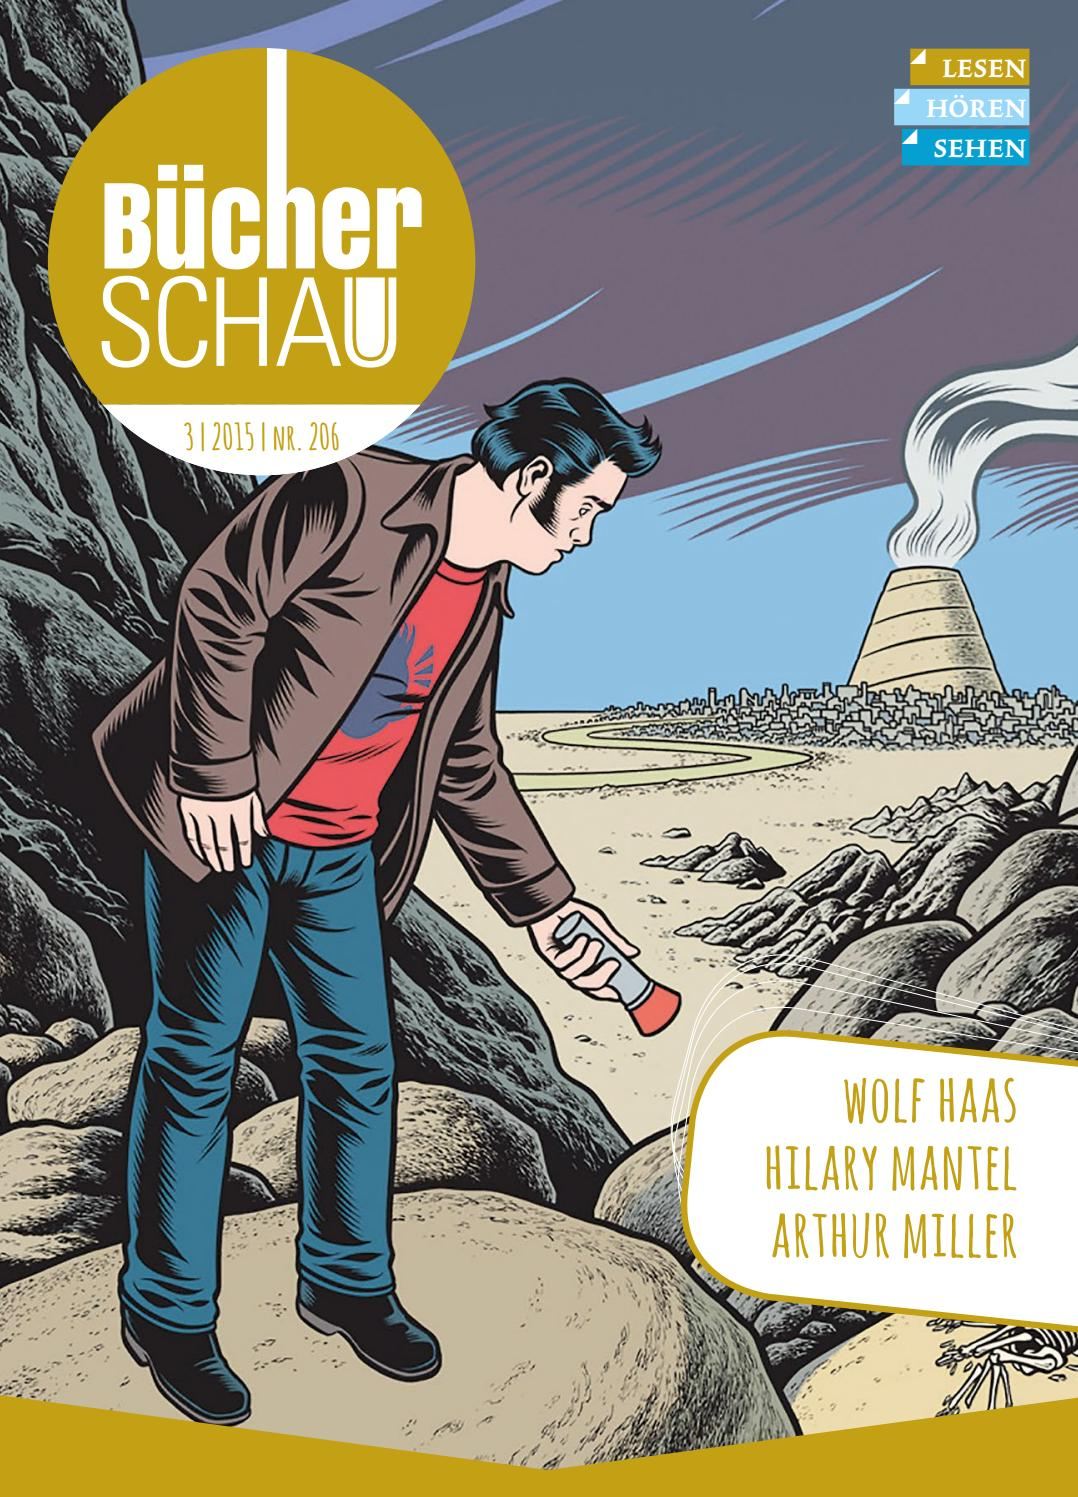 Strecker nackt benjamin Discover Benjamin